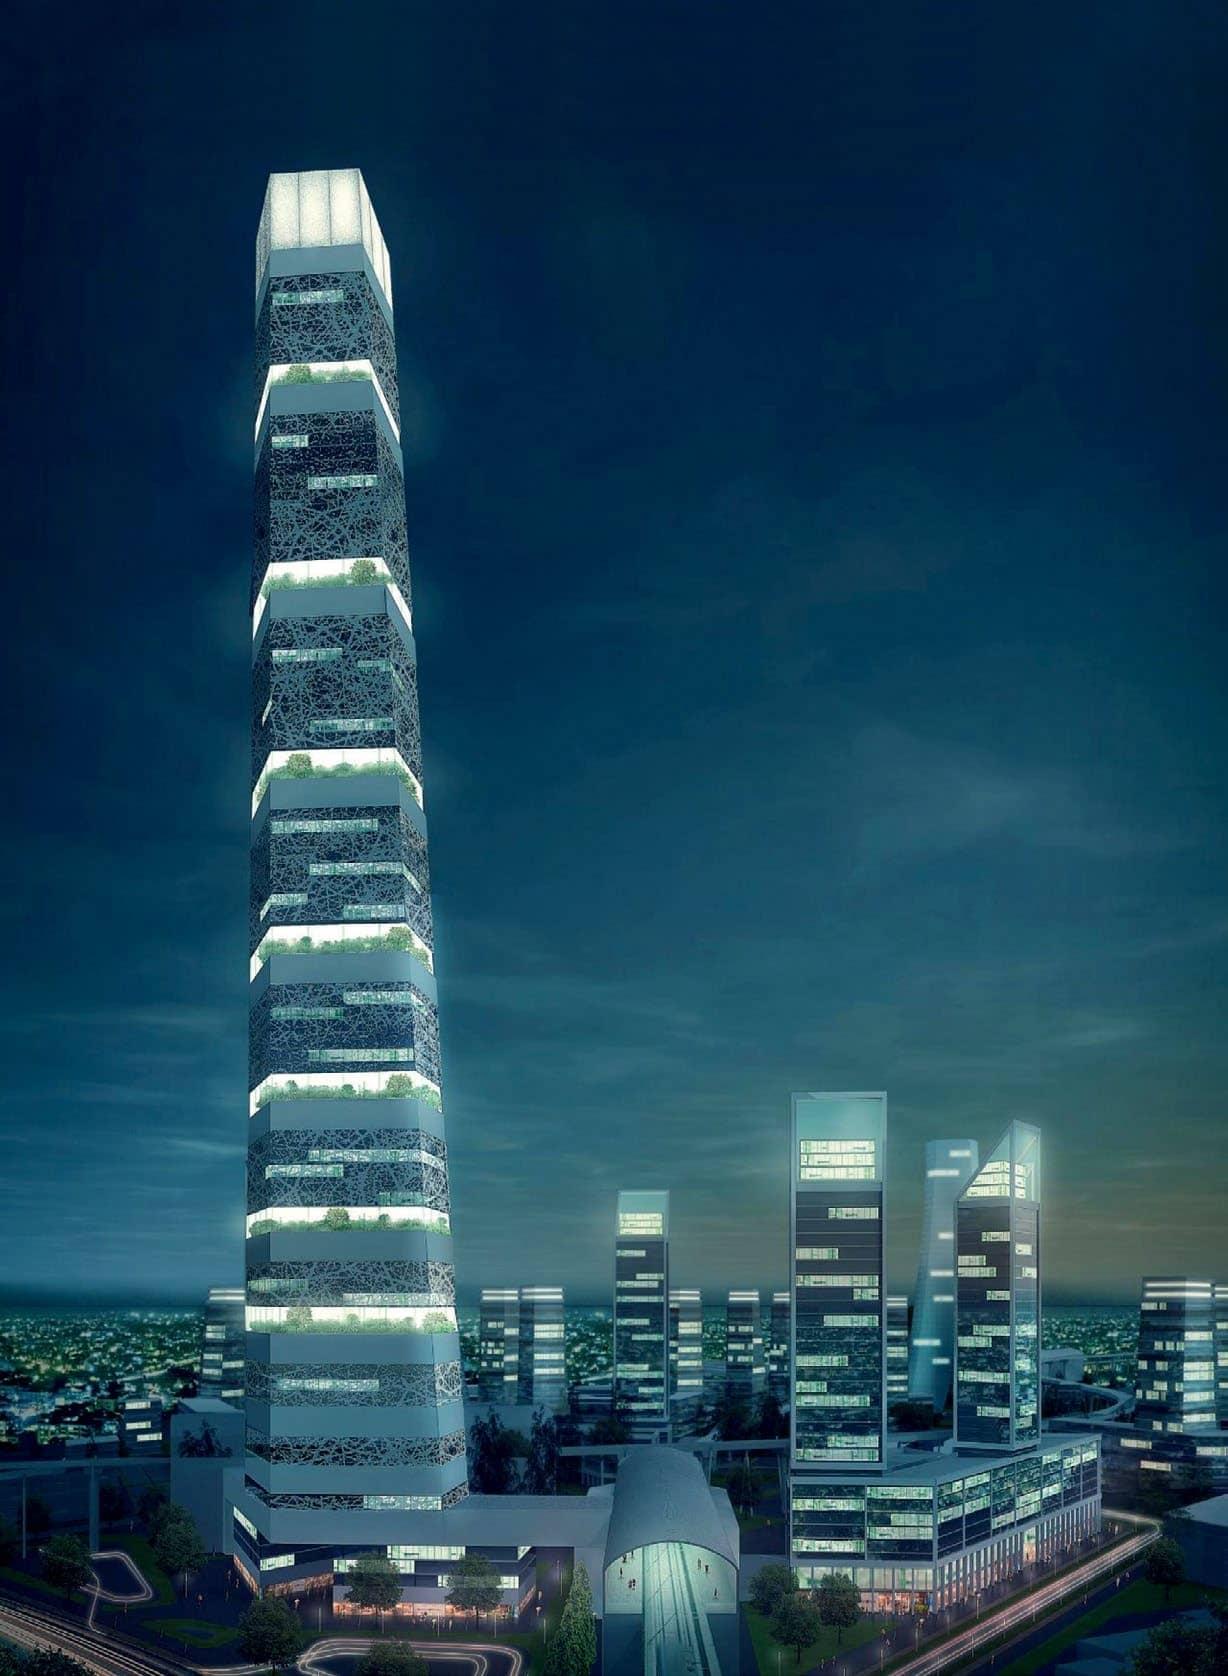 A Miniature Smart City